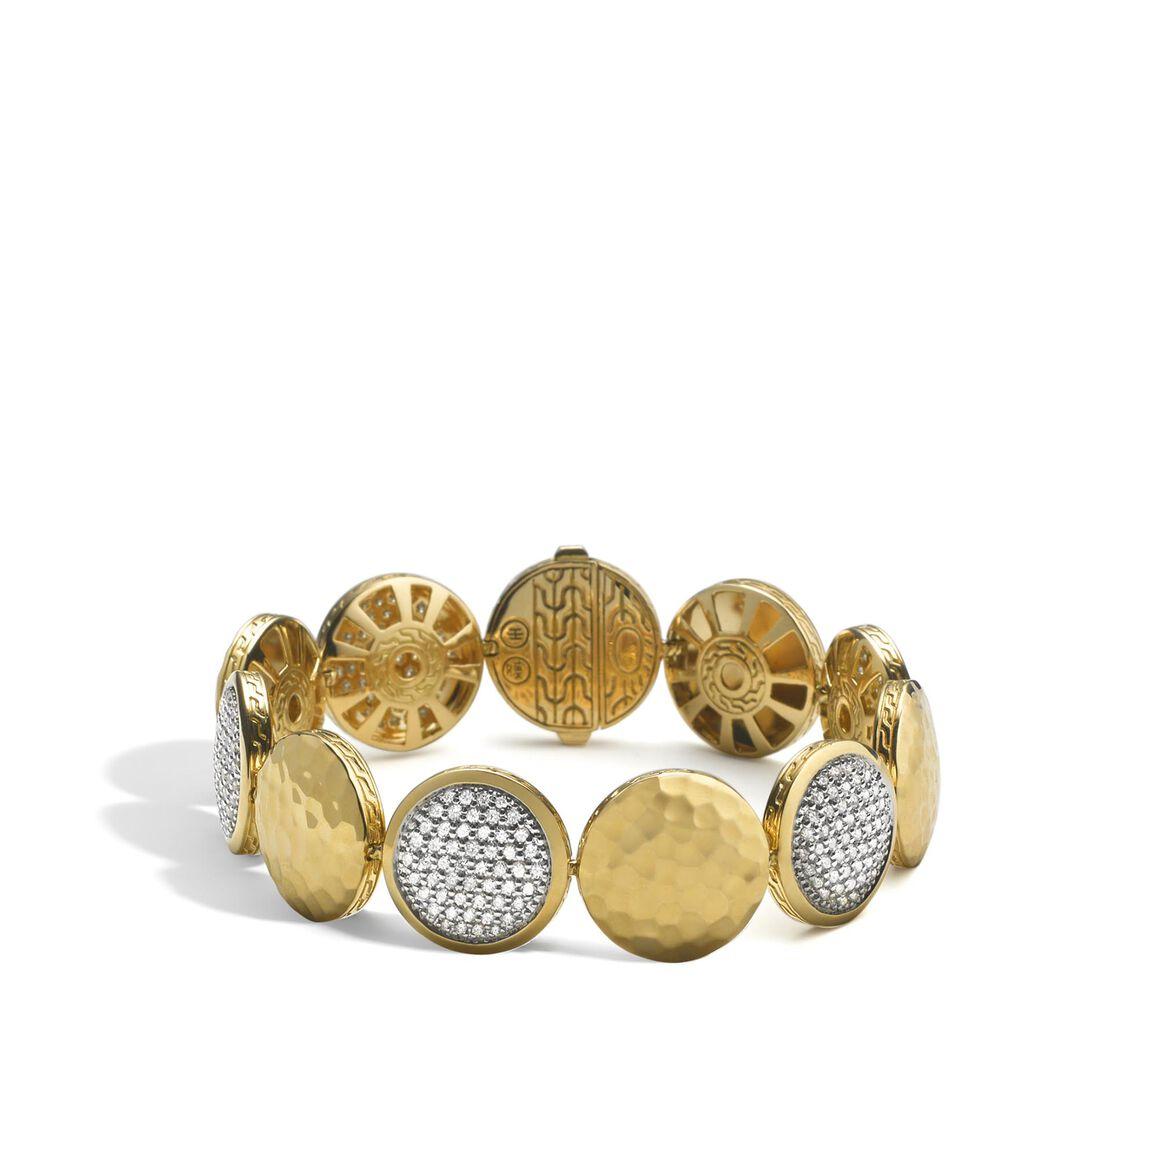 Dot 16MM Link Bracelet in 18K Gold with Diamonds